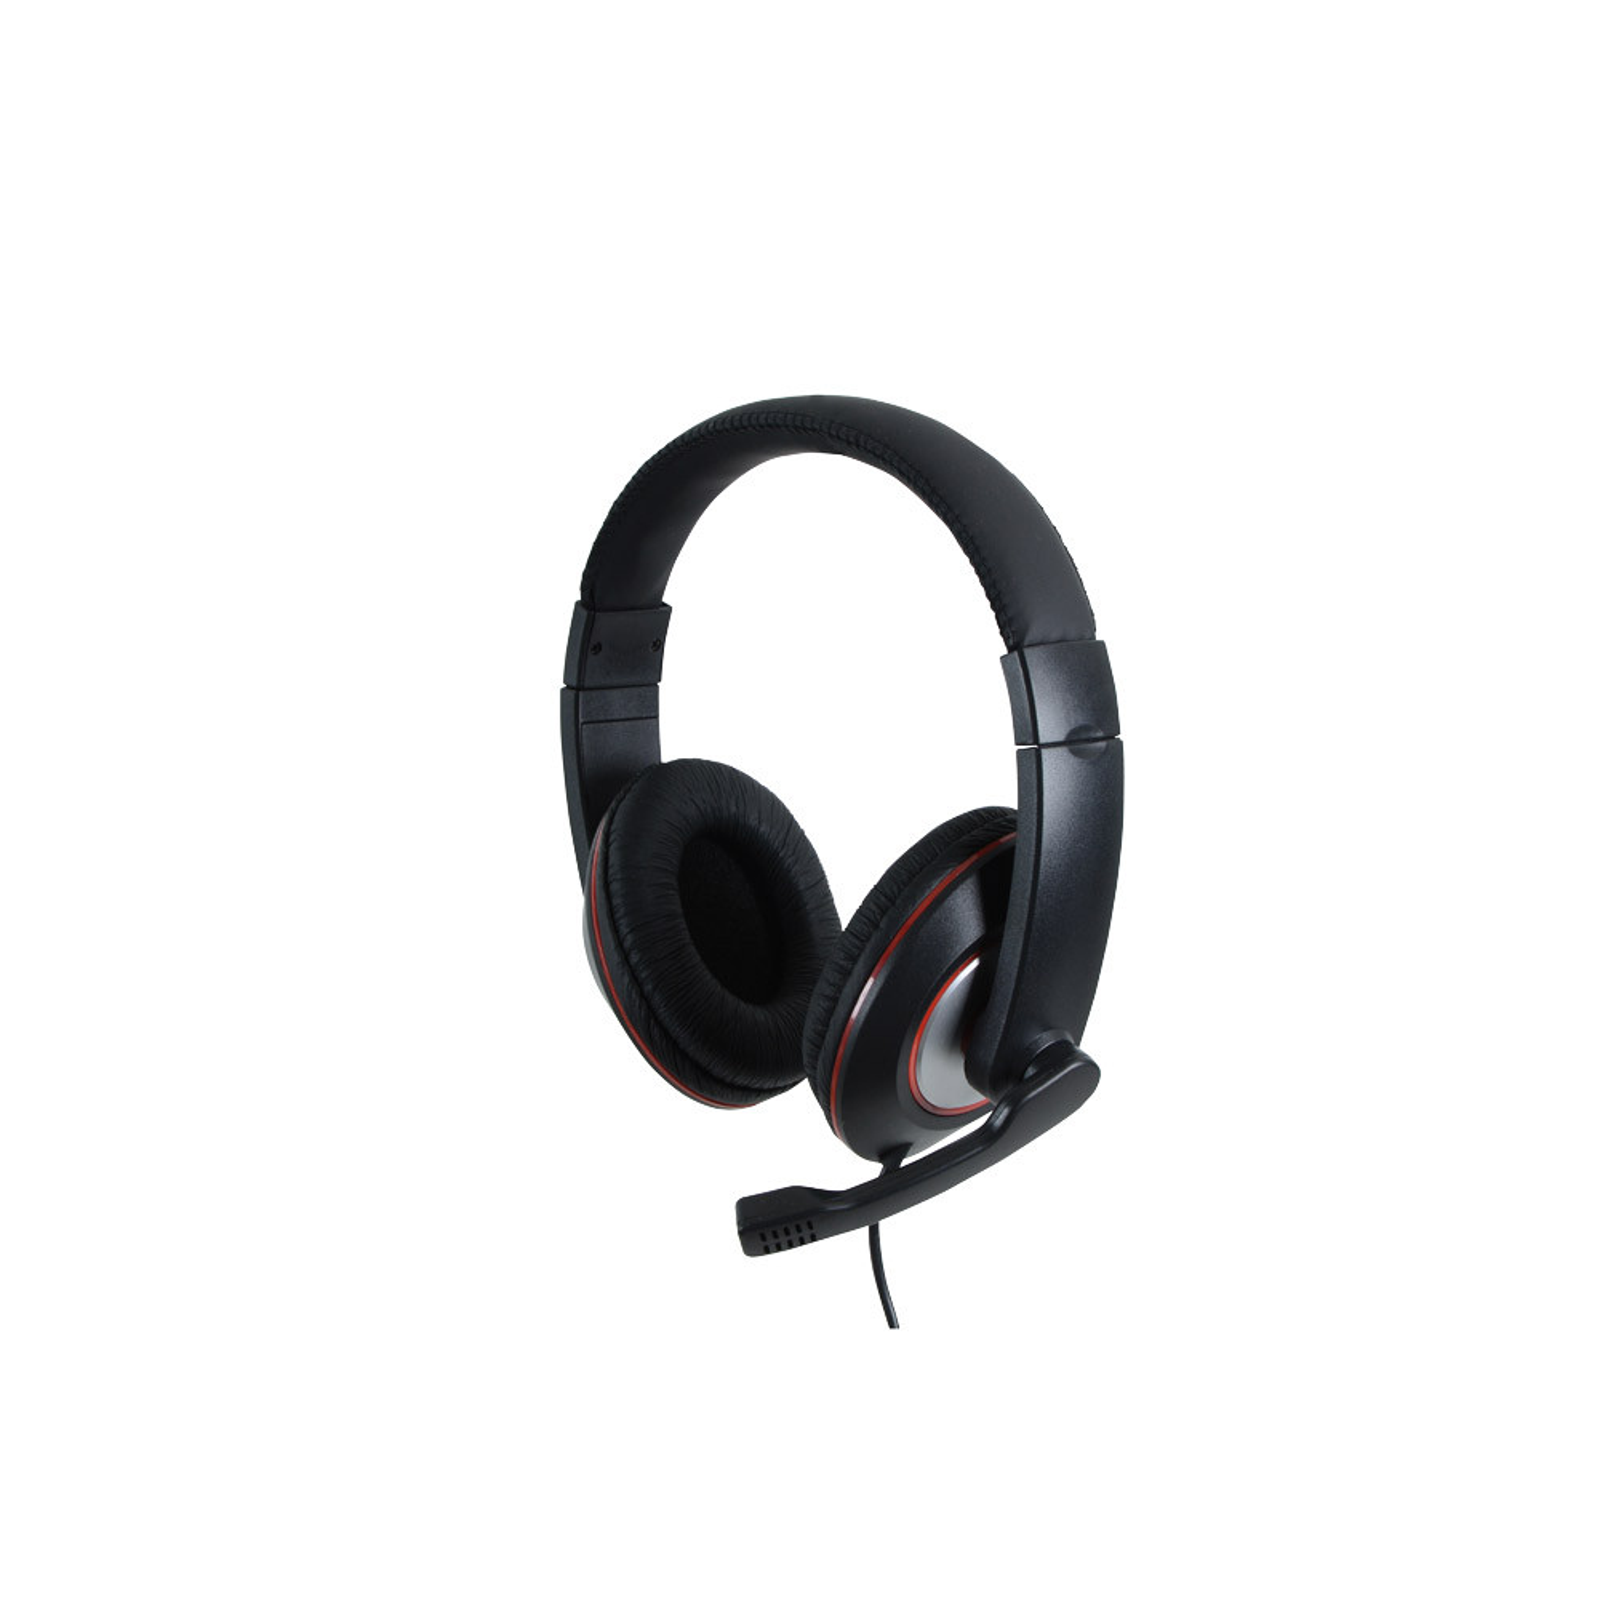 Premium Computer Headphones